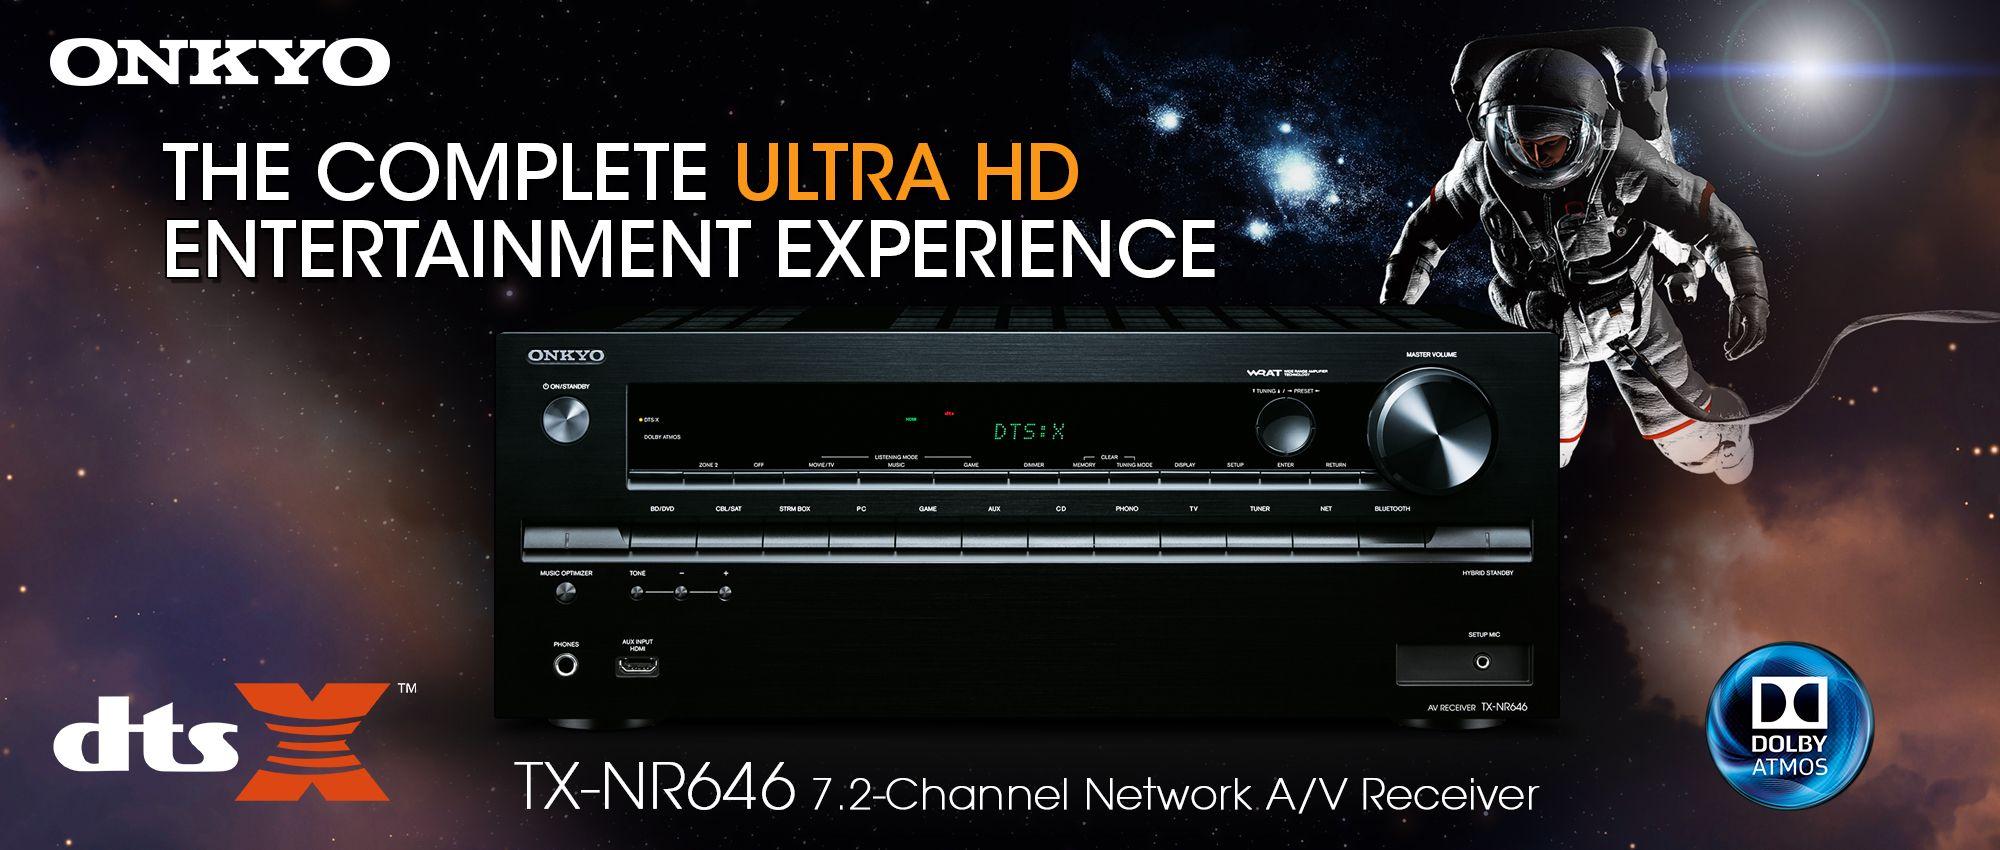 Onkyo TX-NR646 home theater receiver